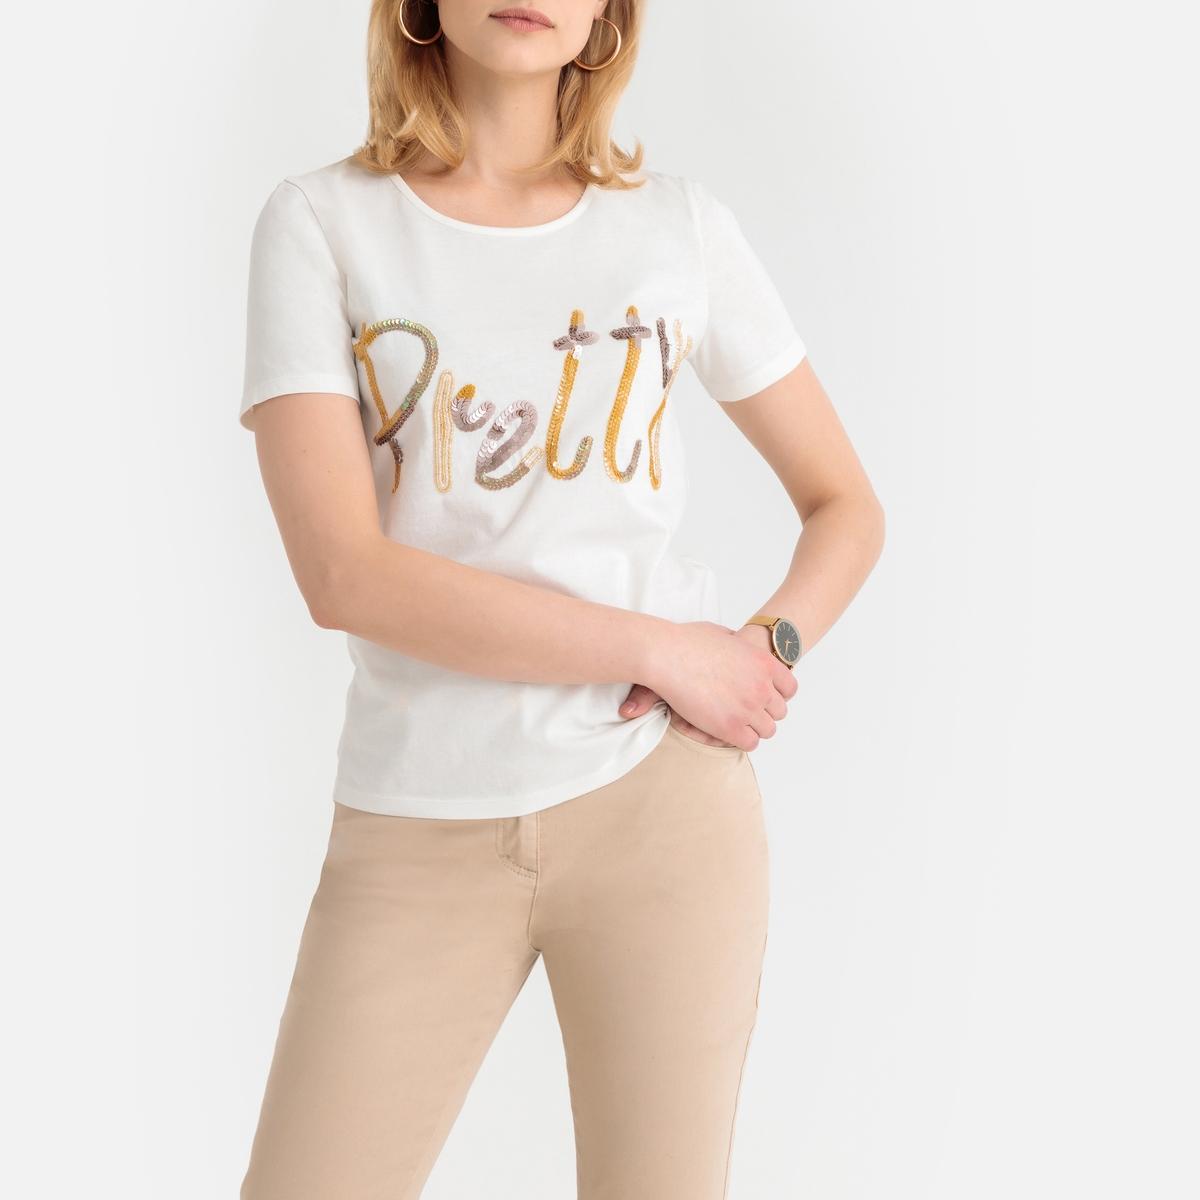 T-shirt de gola redonda, mangas curtas, lantejoulas à frente